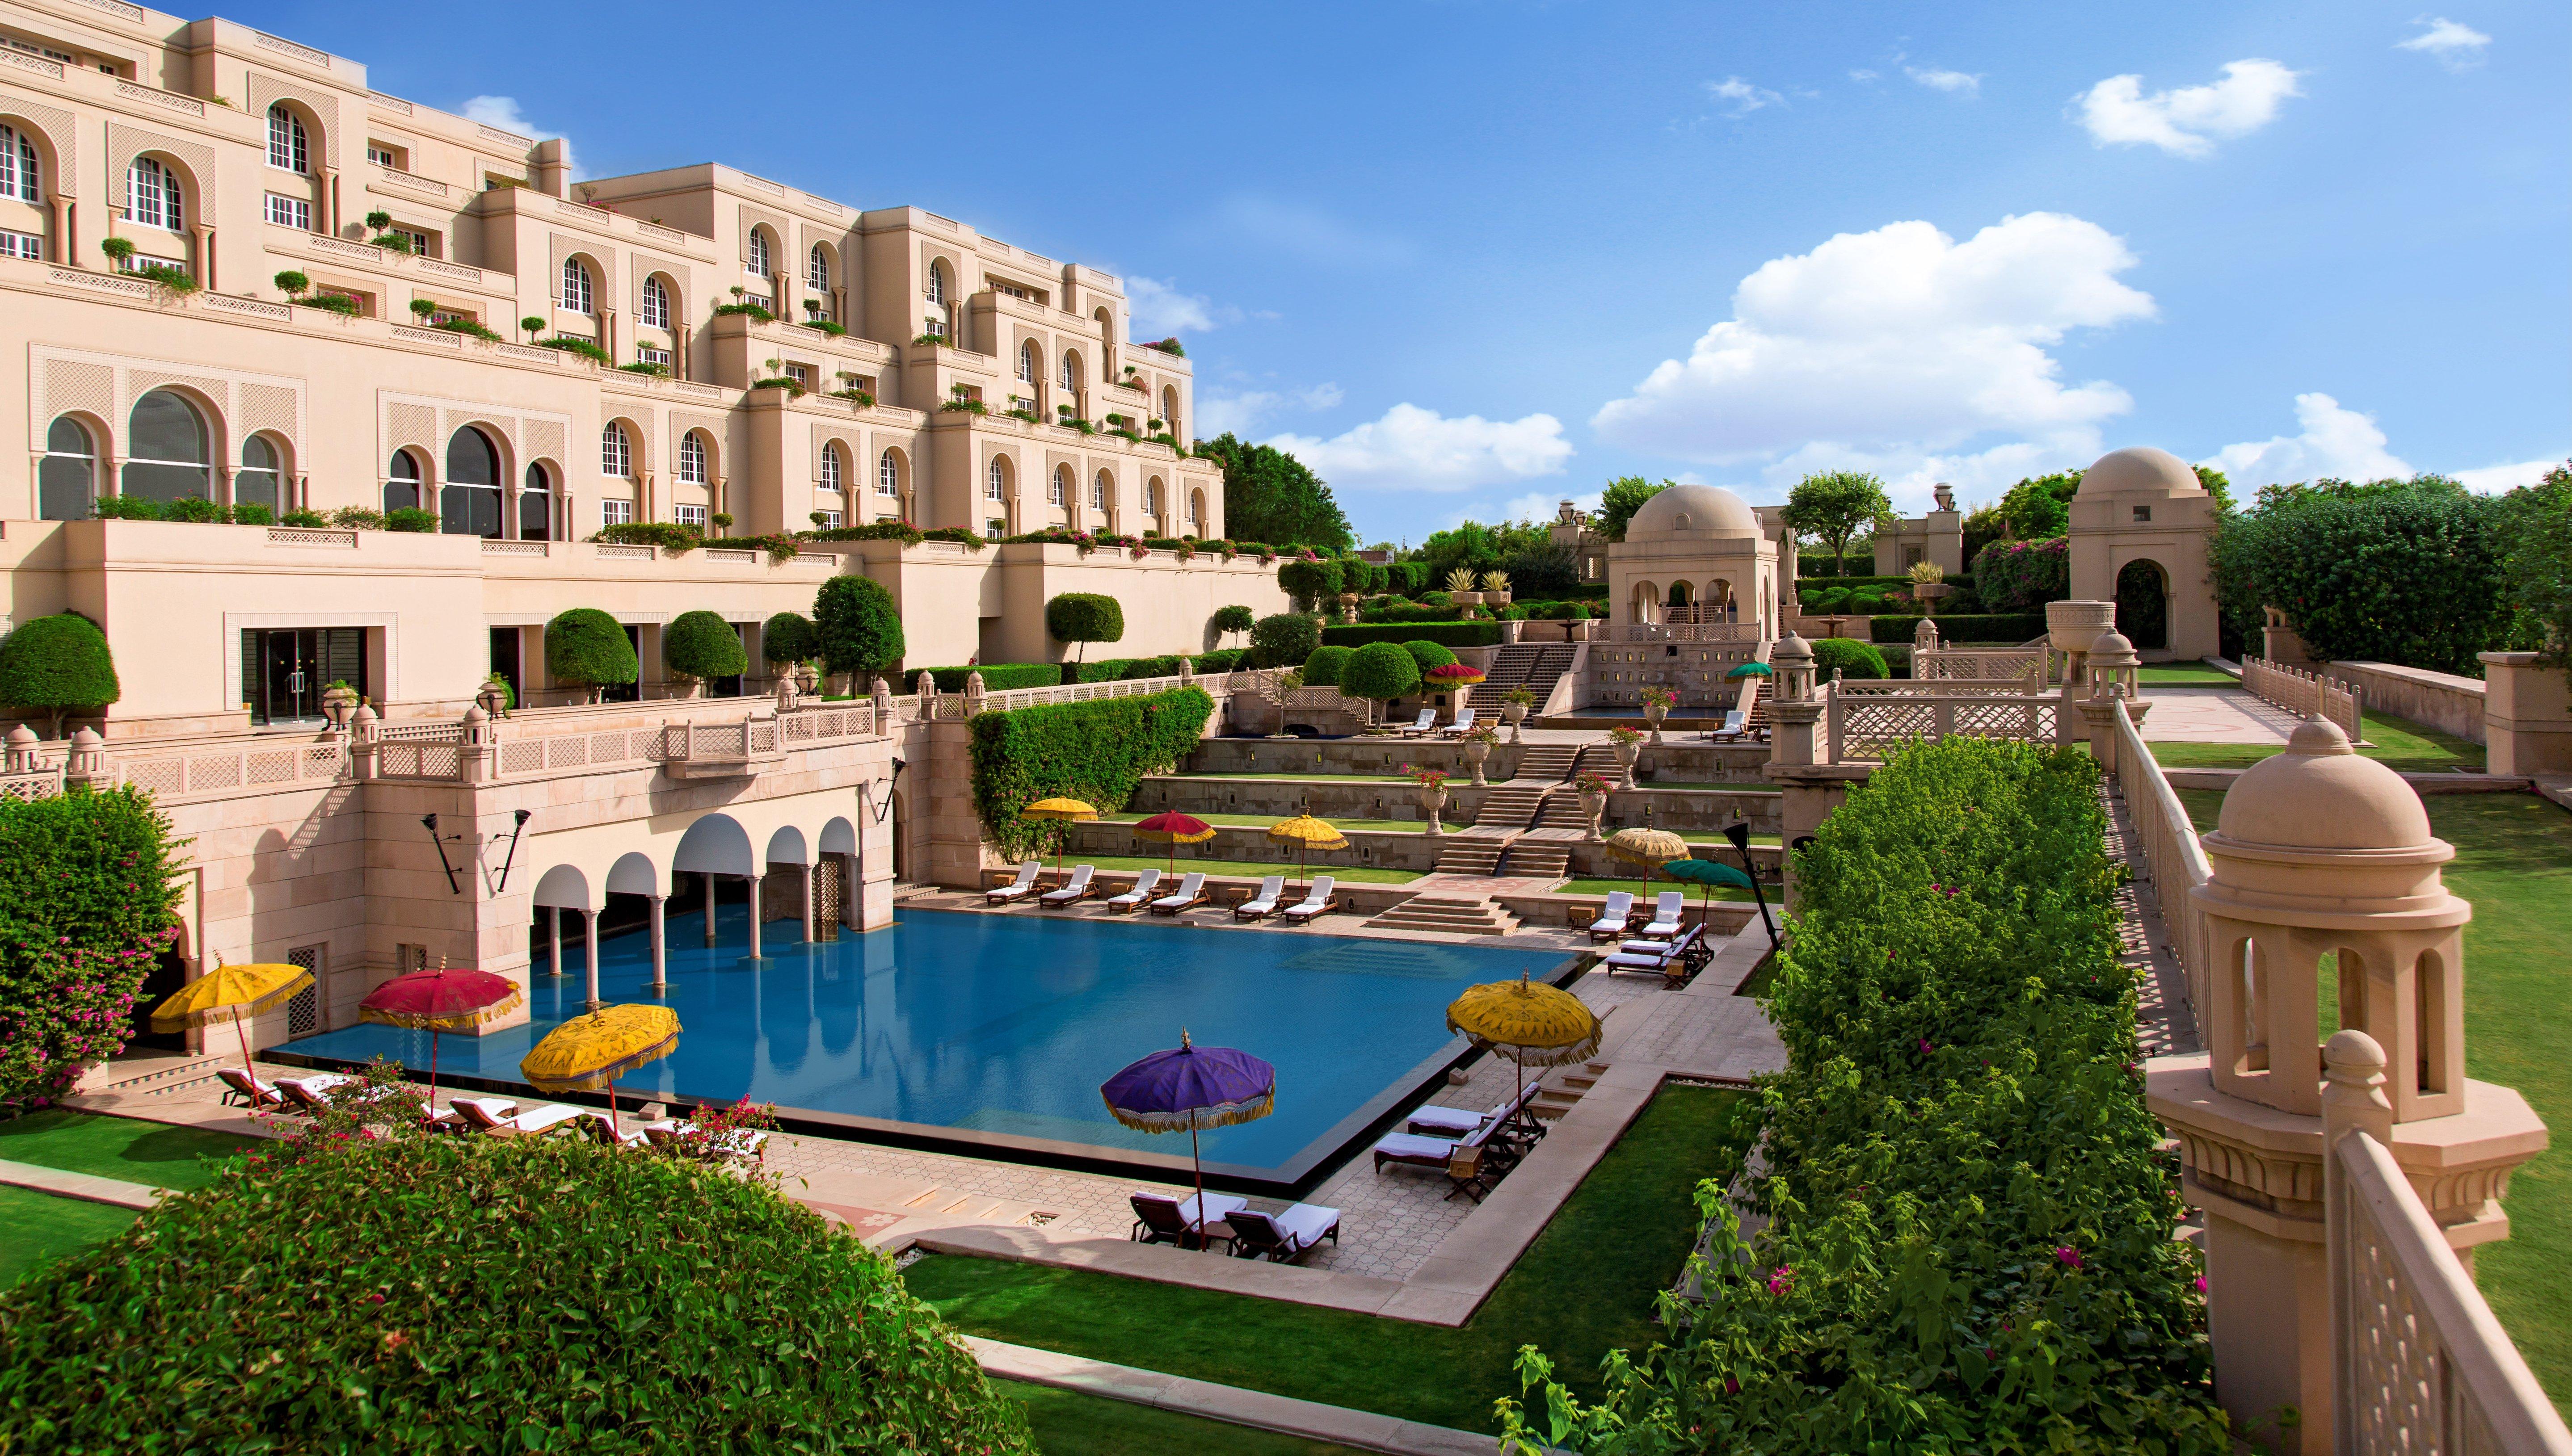 oberoi-amarvilas-luxury-hotel-agra